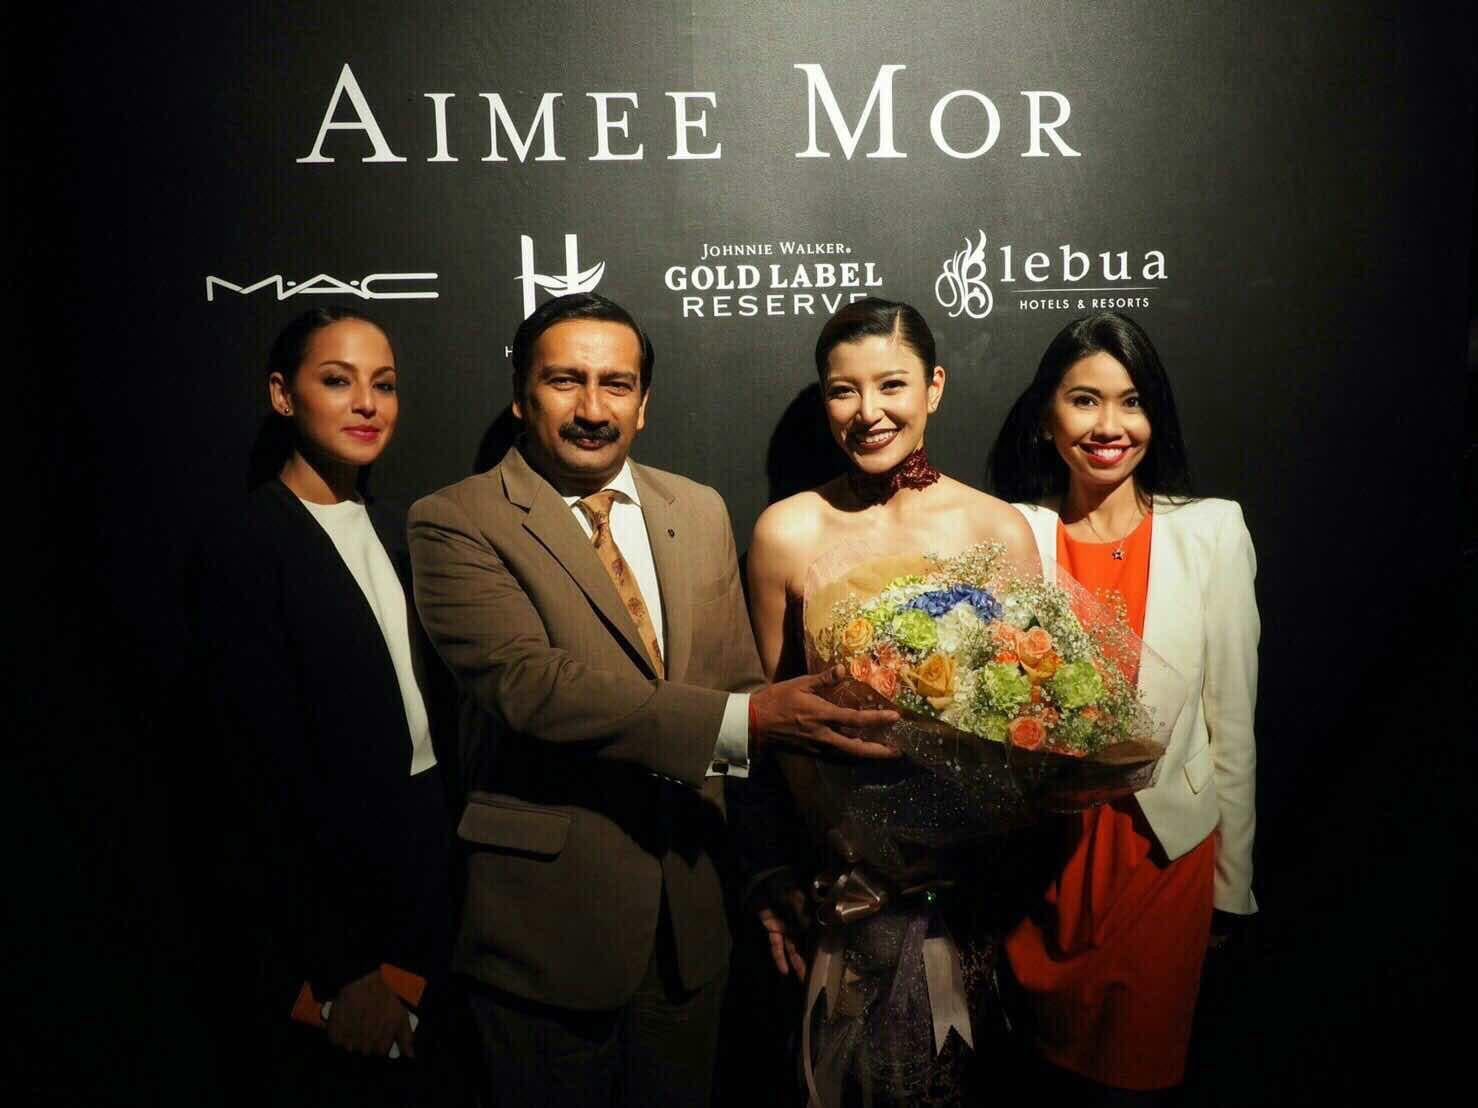 lebua Hotels & Resorts congratulates Miss Thailand Universe 2004 Aimee Morakot at the fashion show